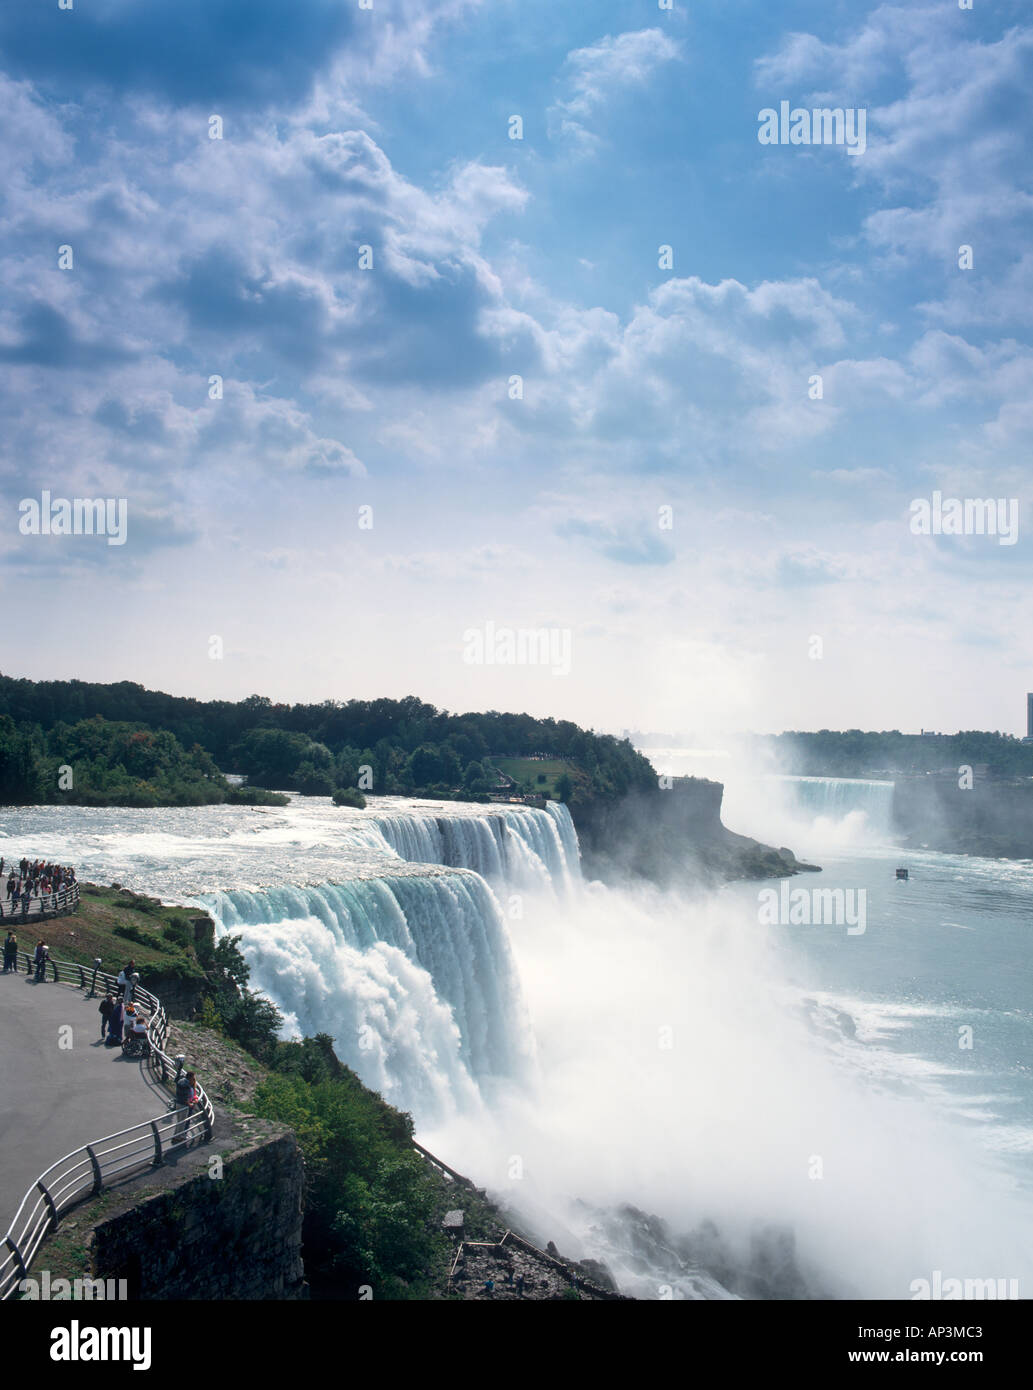 Us Side Of The Niagara Falls New York State Usa Stock